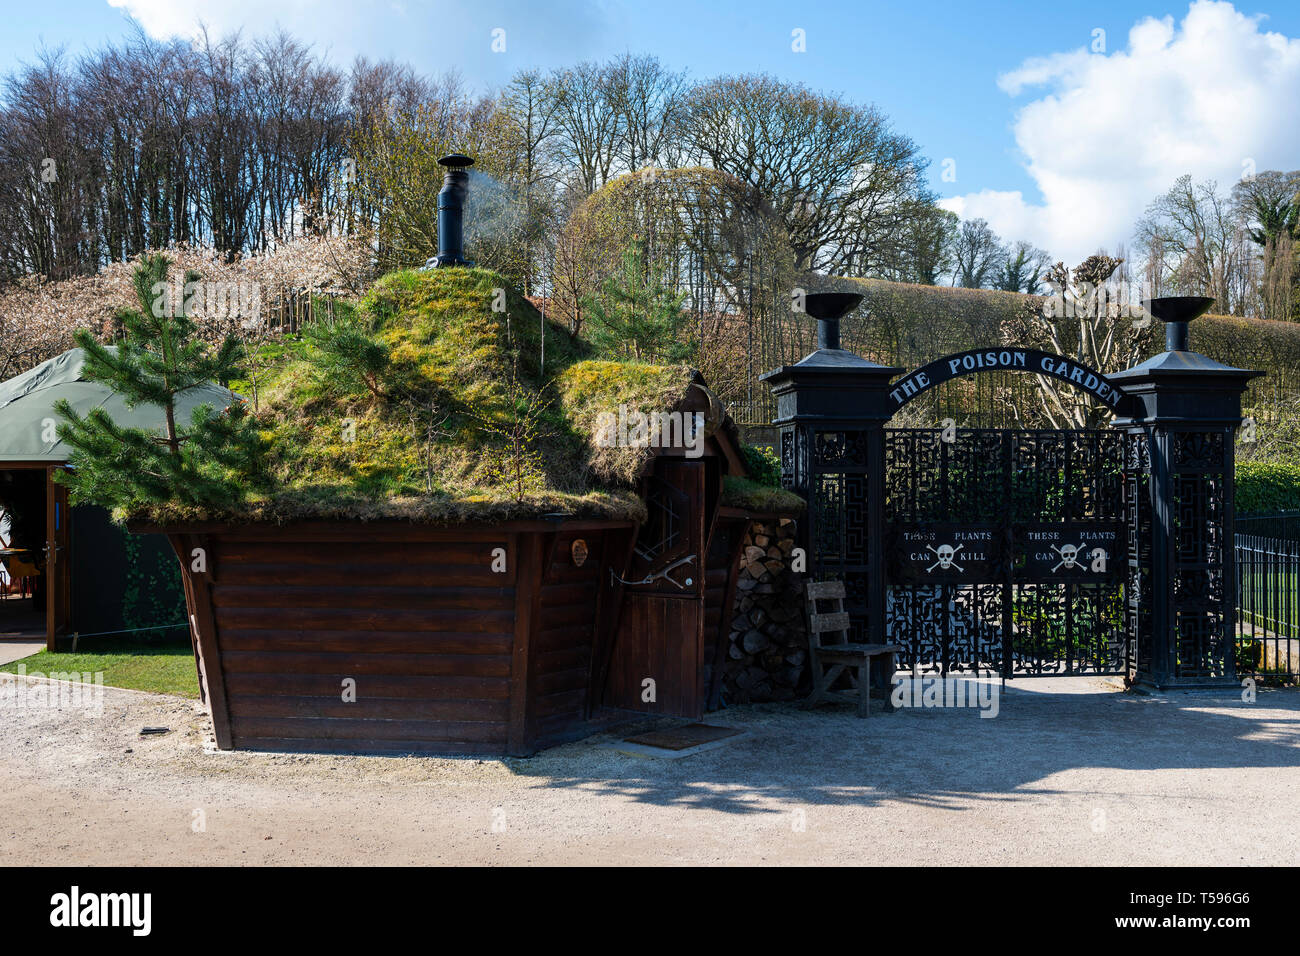 Entrance to Poison Garden at Alnwick Garden, Alnwick, Northumberland, England, UK - Stock Image